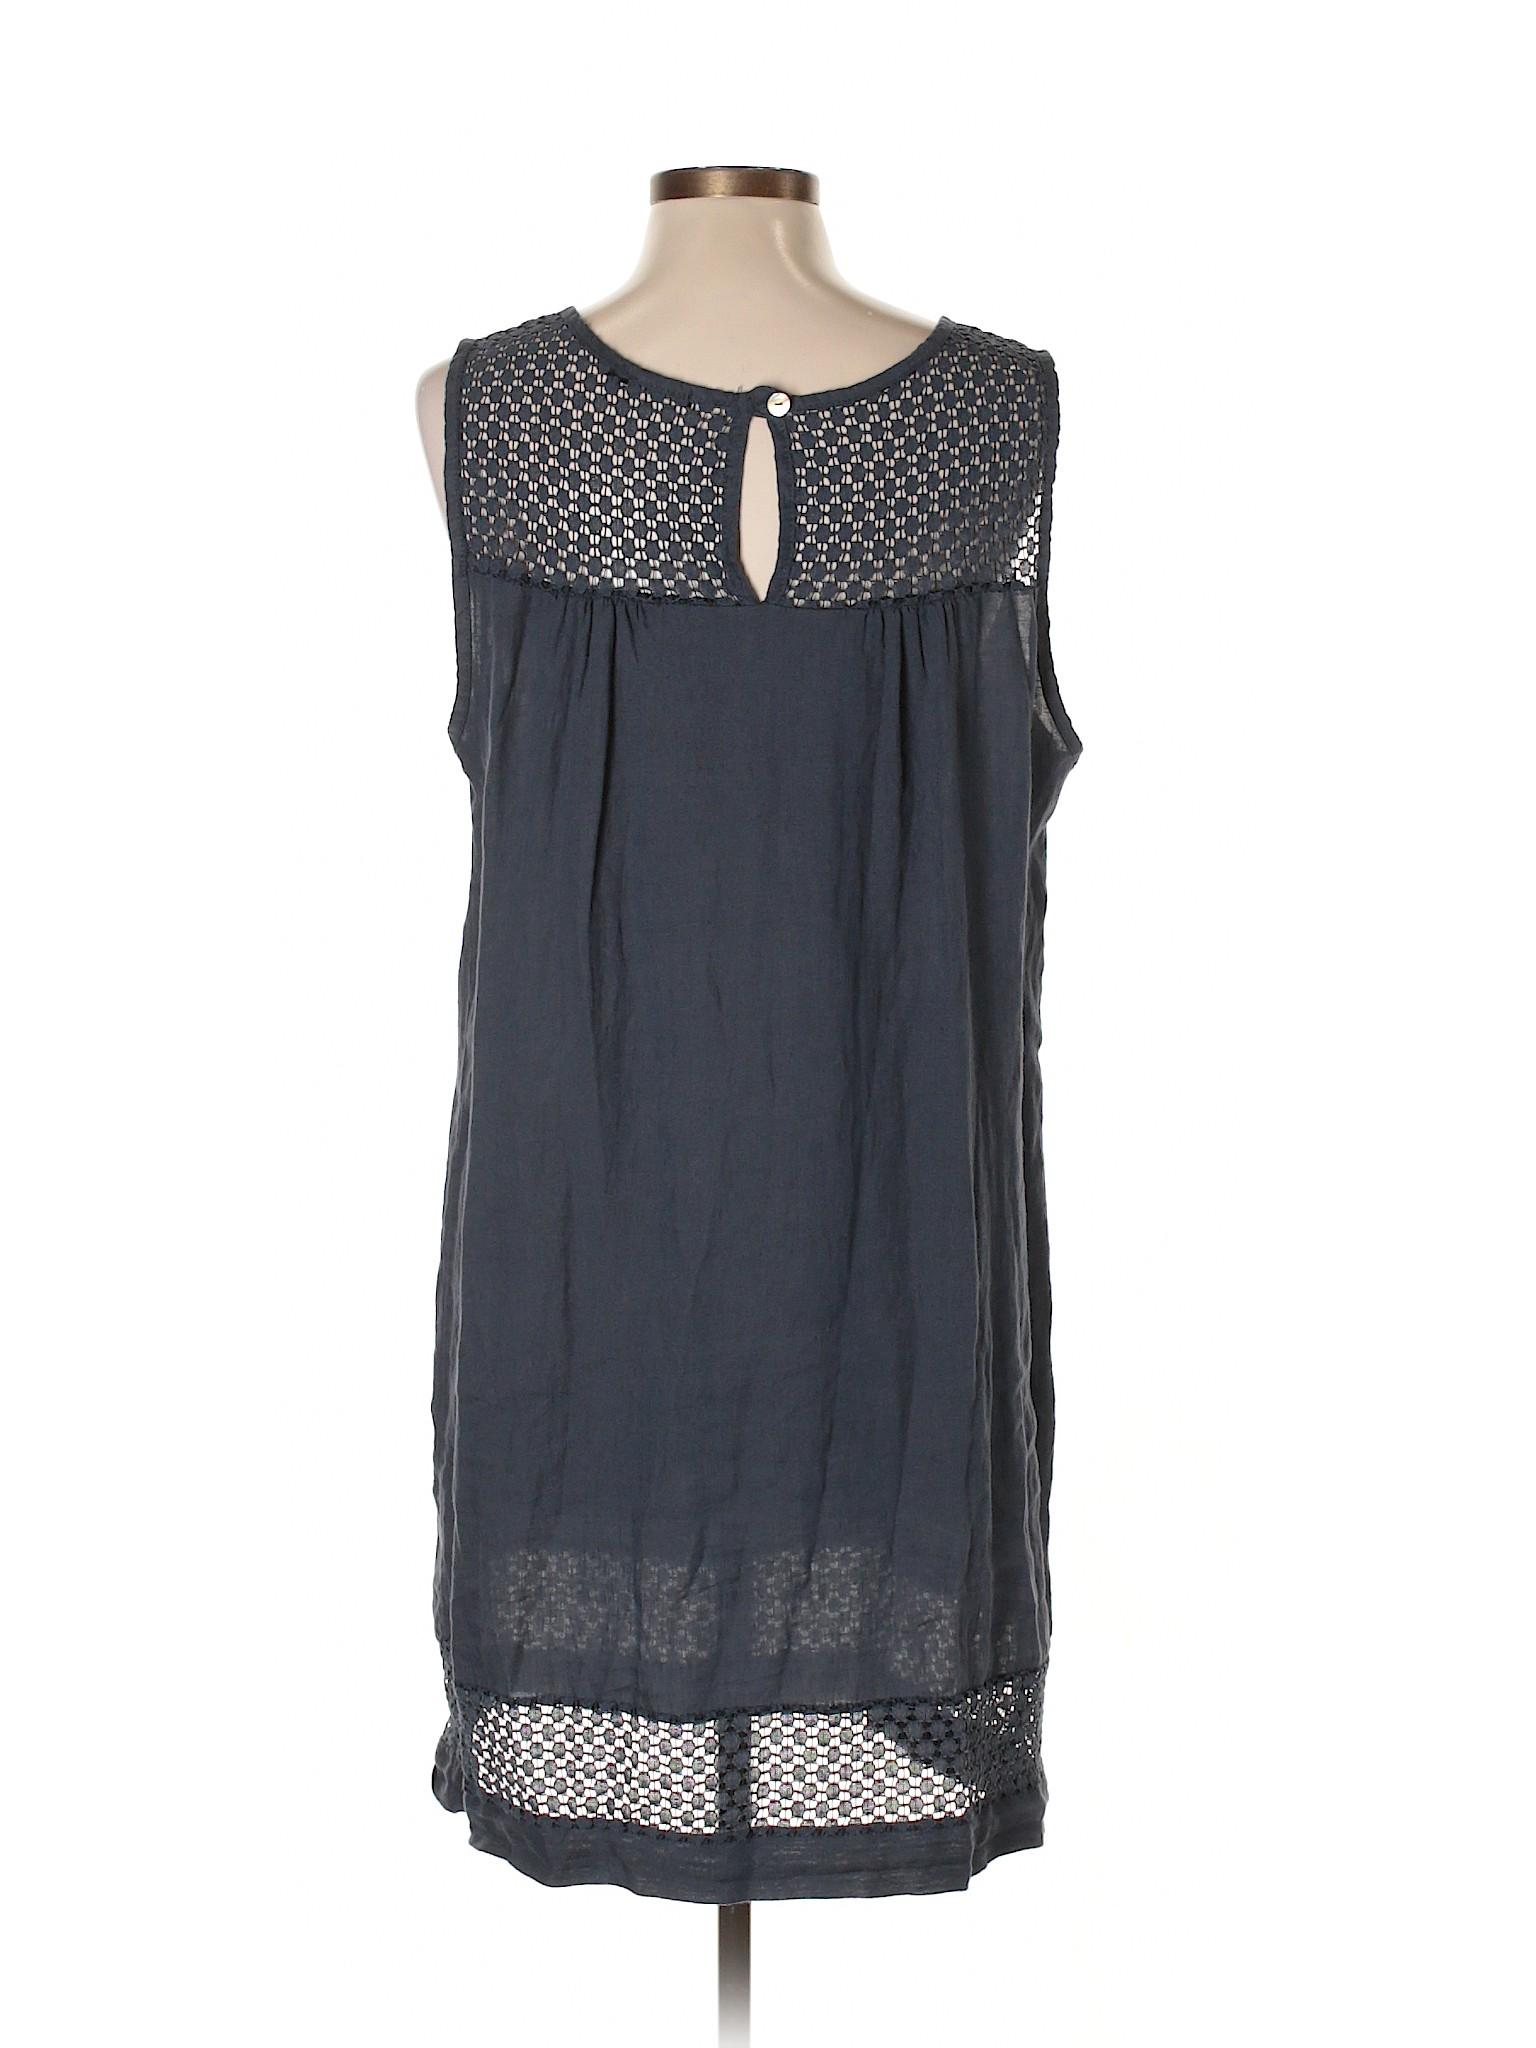 Boutique Lungo L'arno Casual Dress winter fSrxqwf